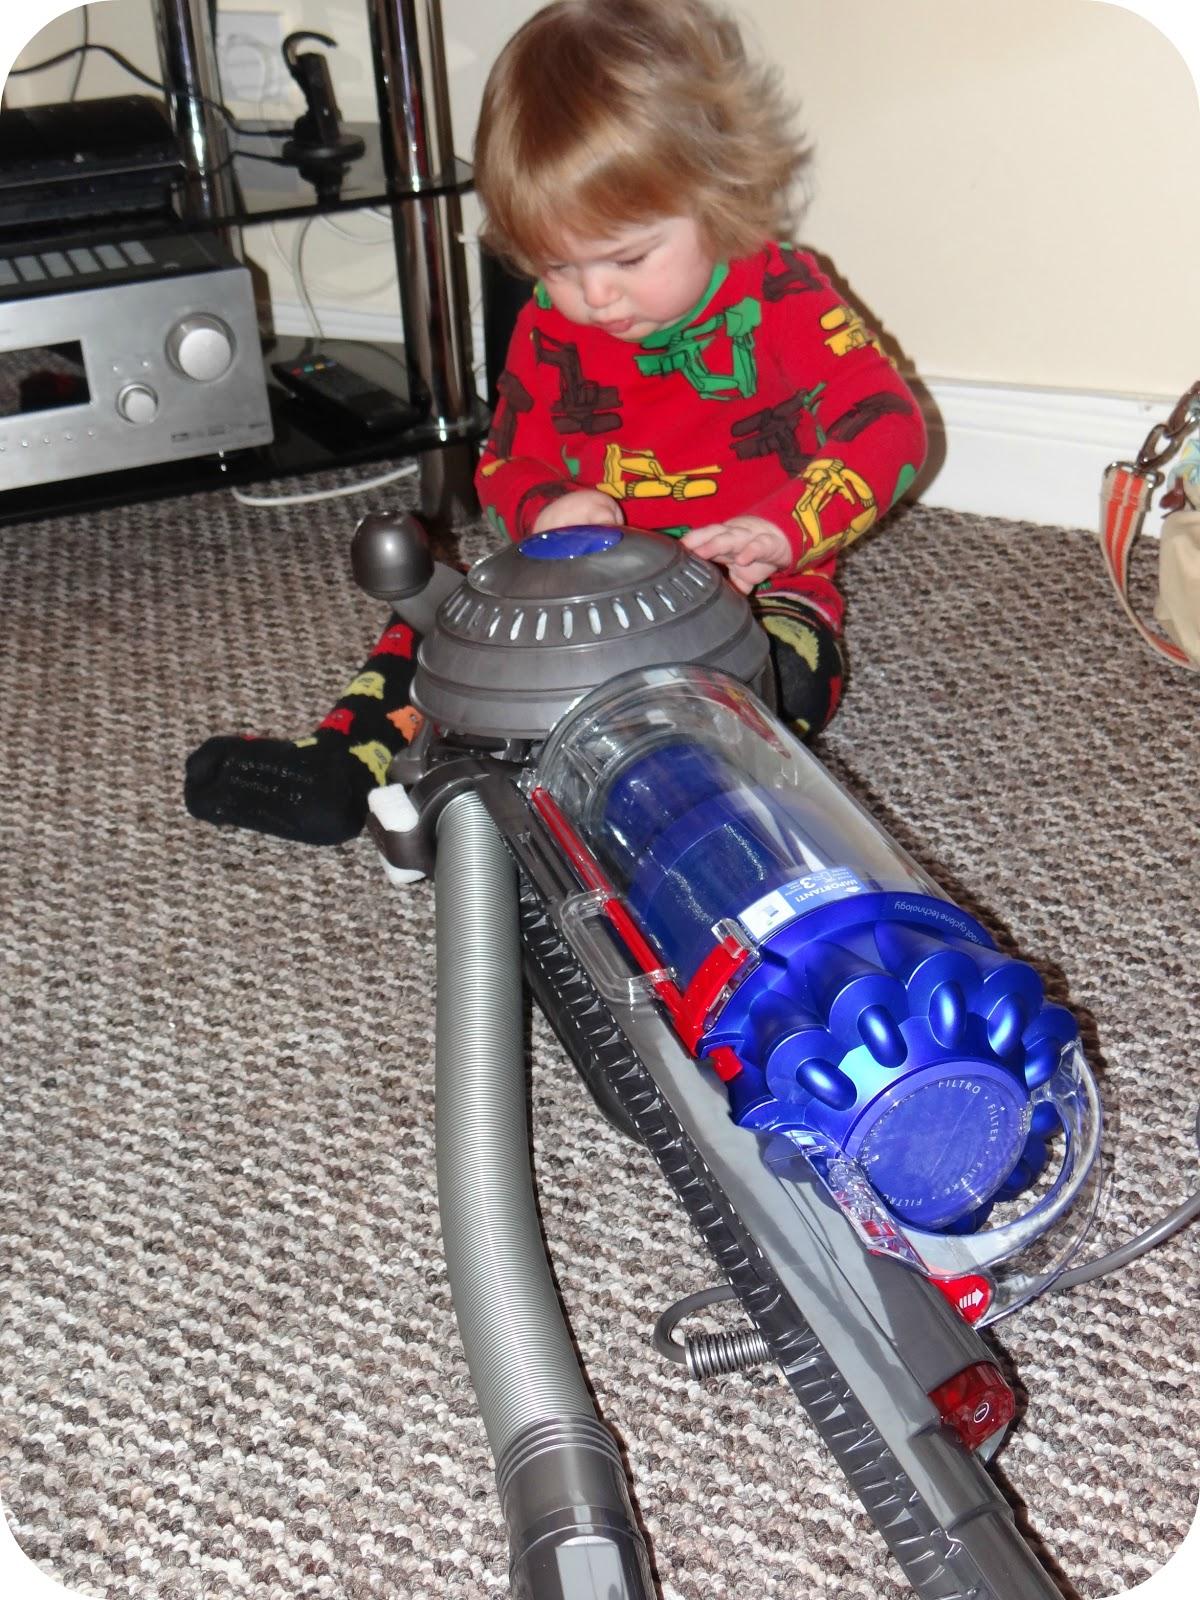 dyson toy vacuum instruction manual